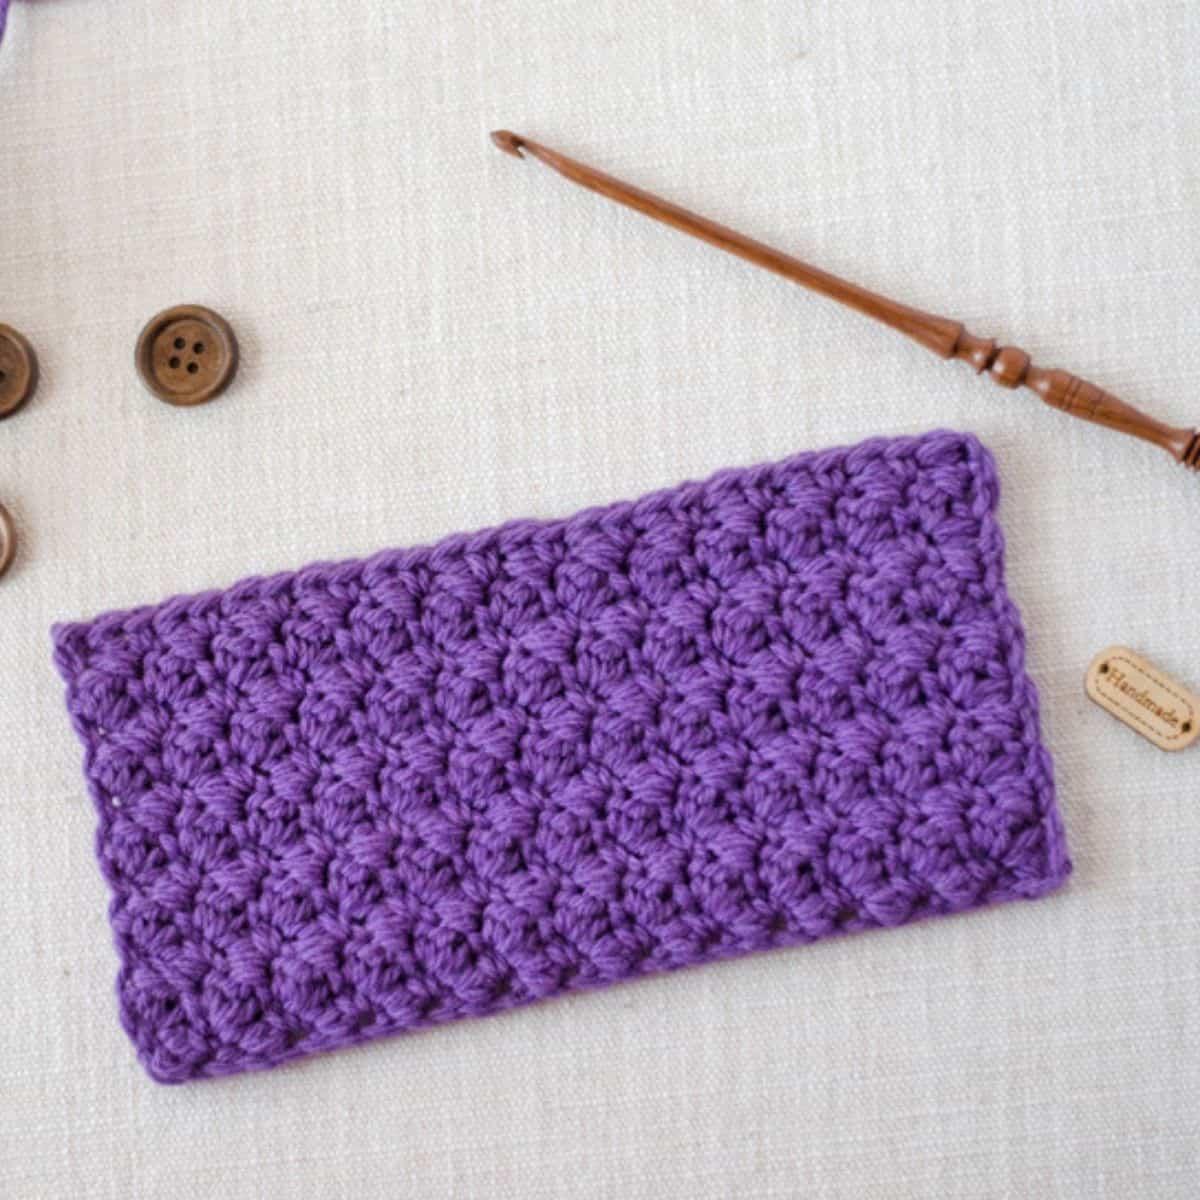 small swatch of crochet grit stitch